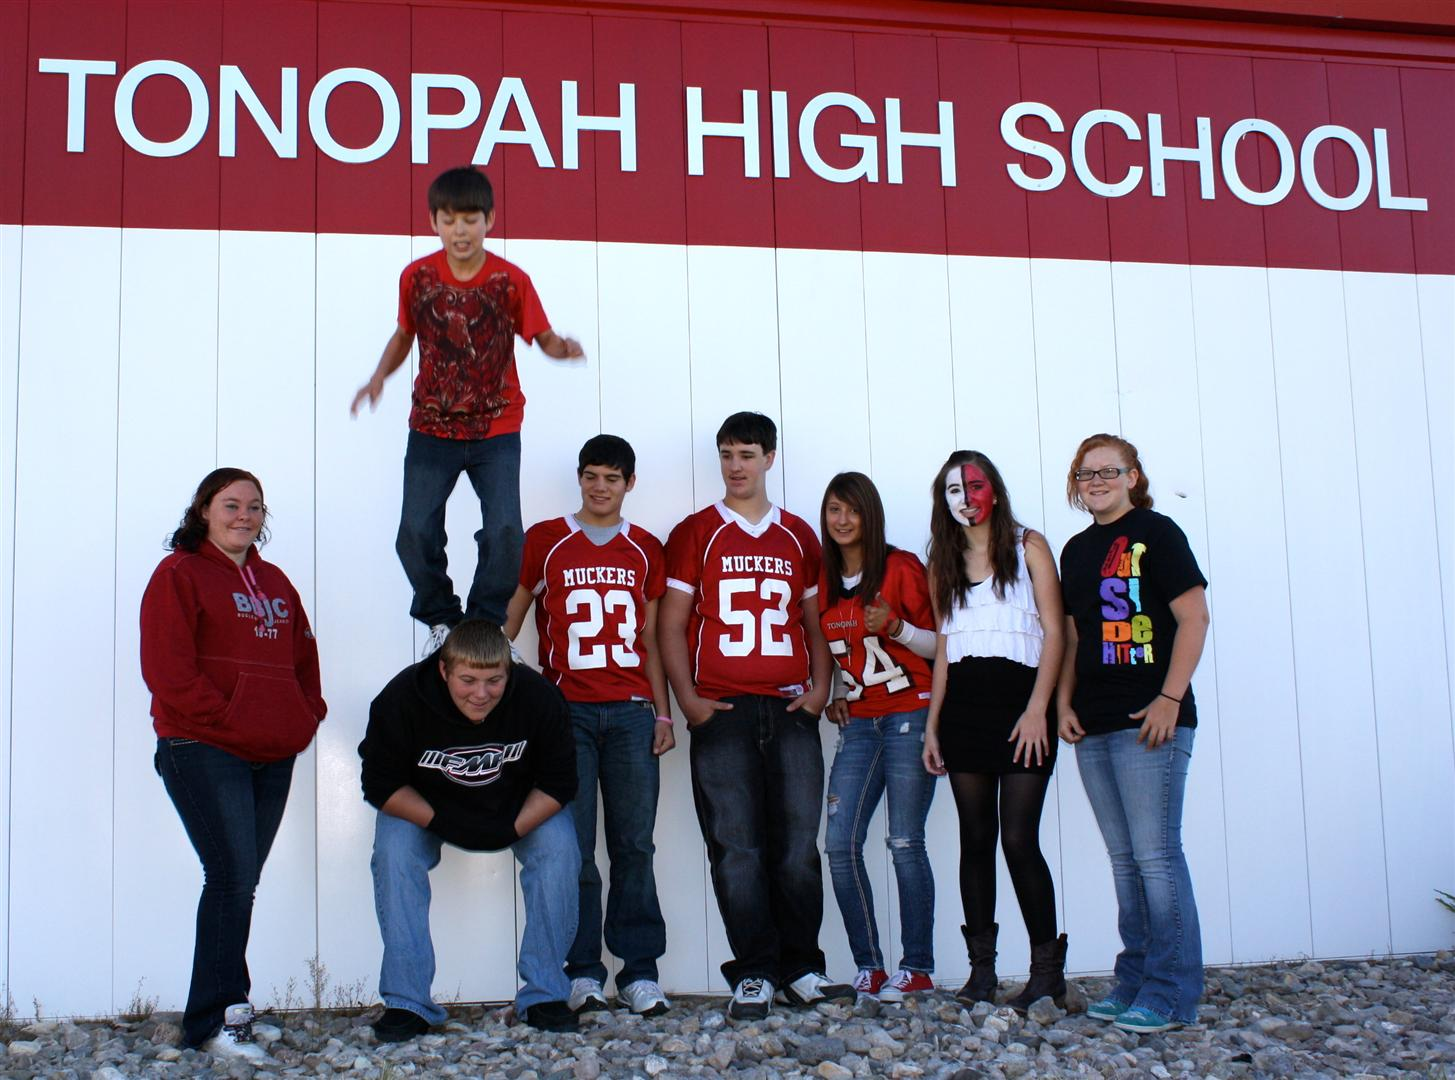 tonopah high school 9 12 contact